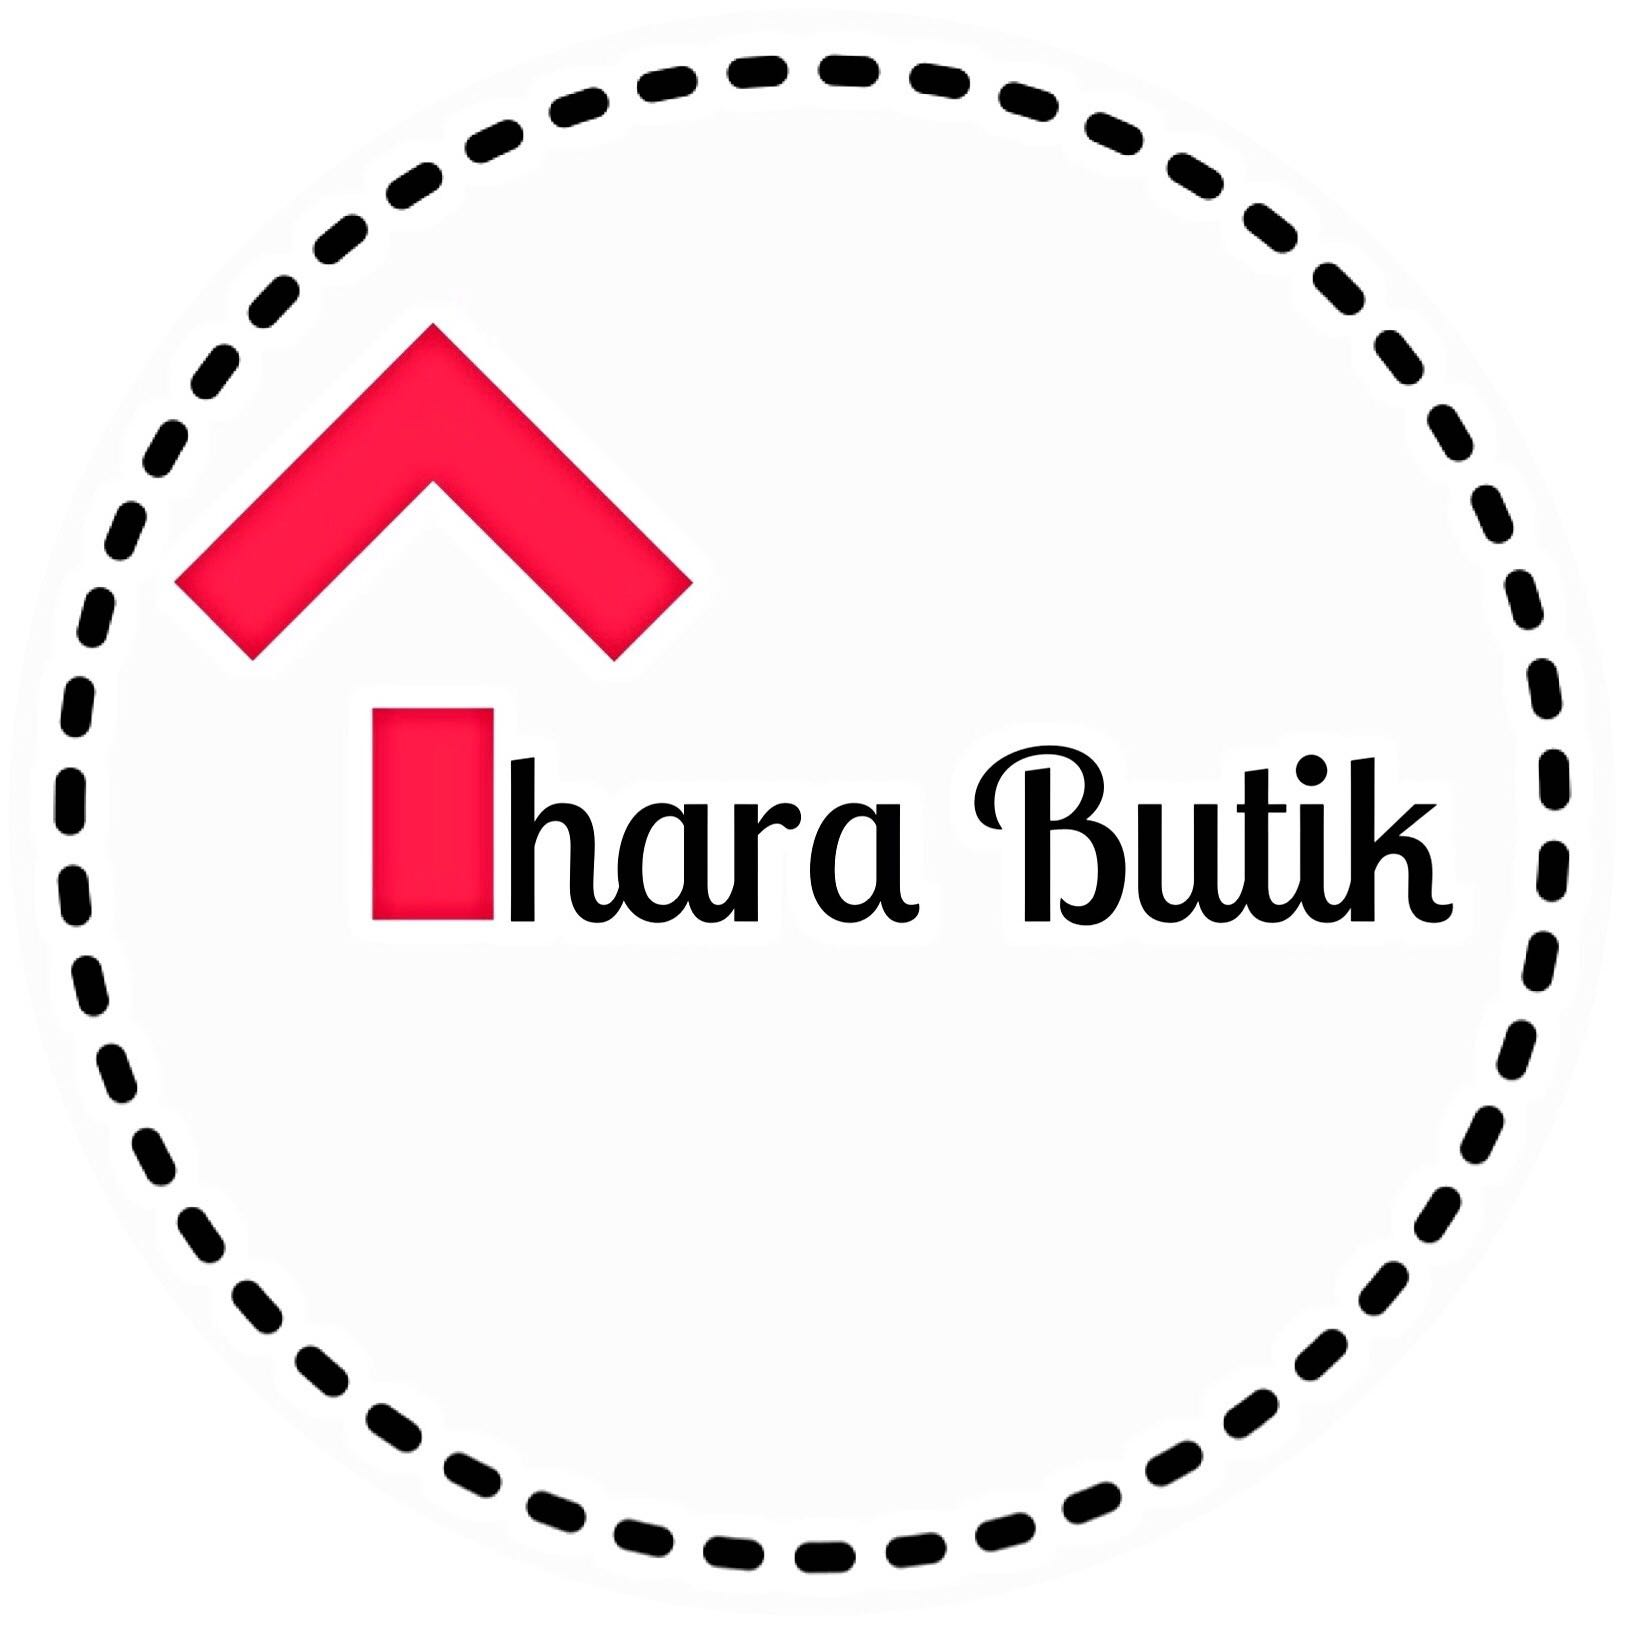 tharabutik